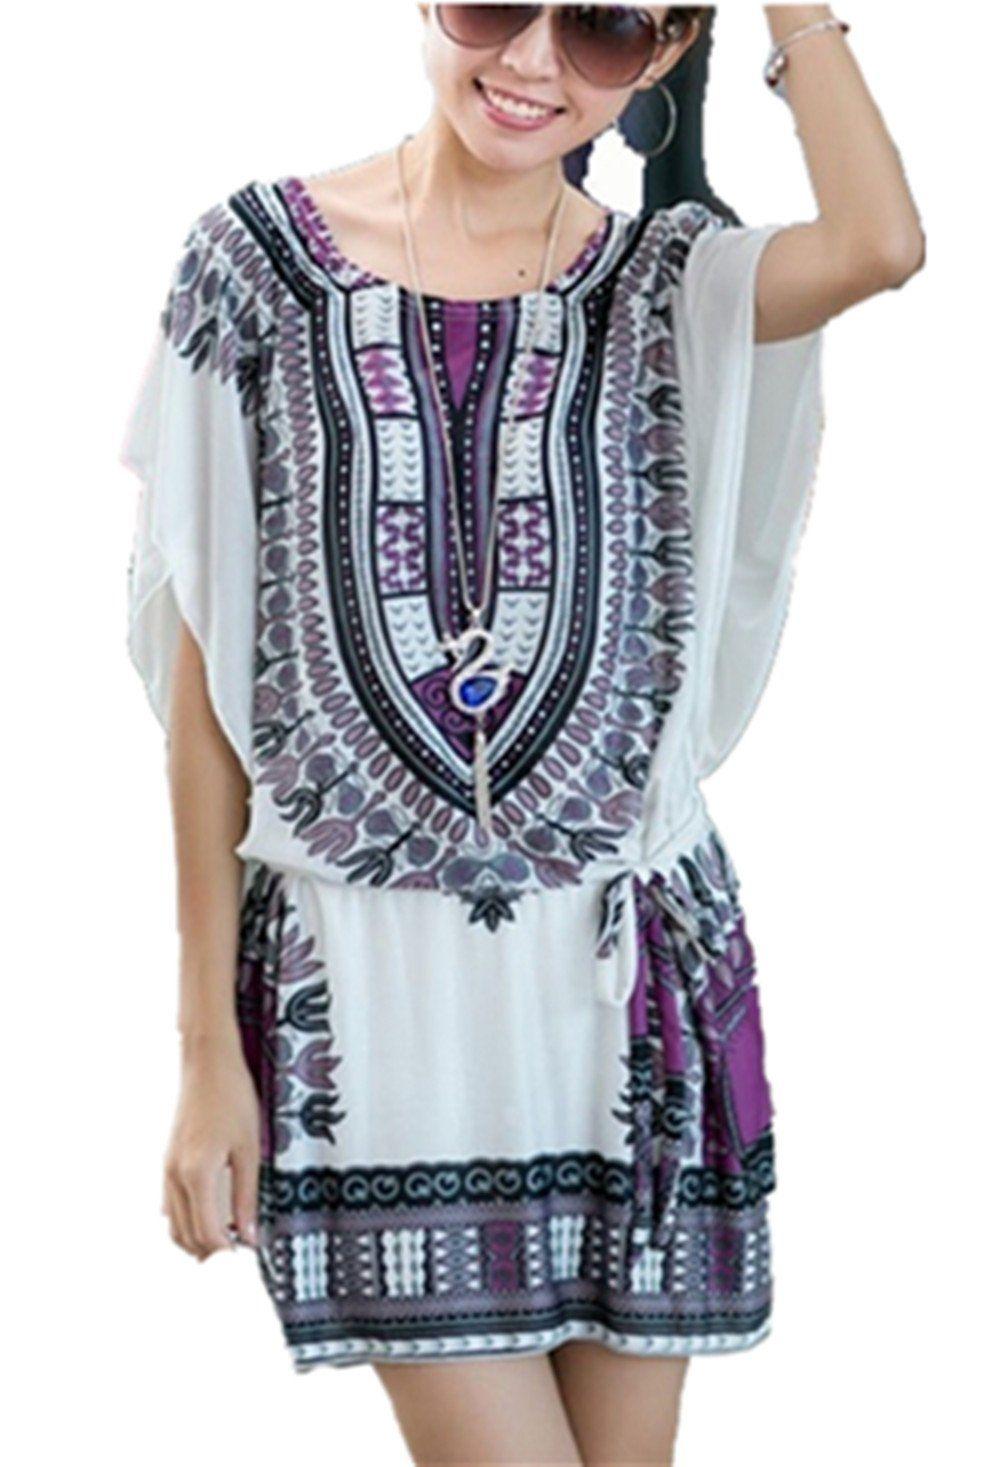 05467086fb Women's Batwing Sleeve Mini Dress BOHO Floral Printing Summer Beach Dress:  Amazon.co.uk: Clothing